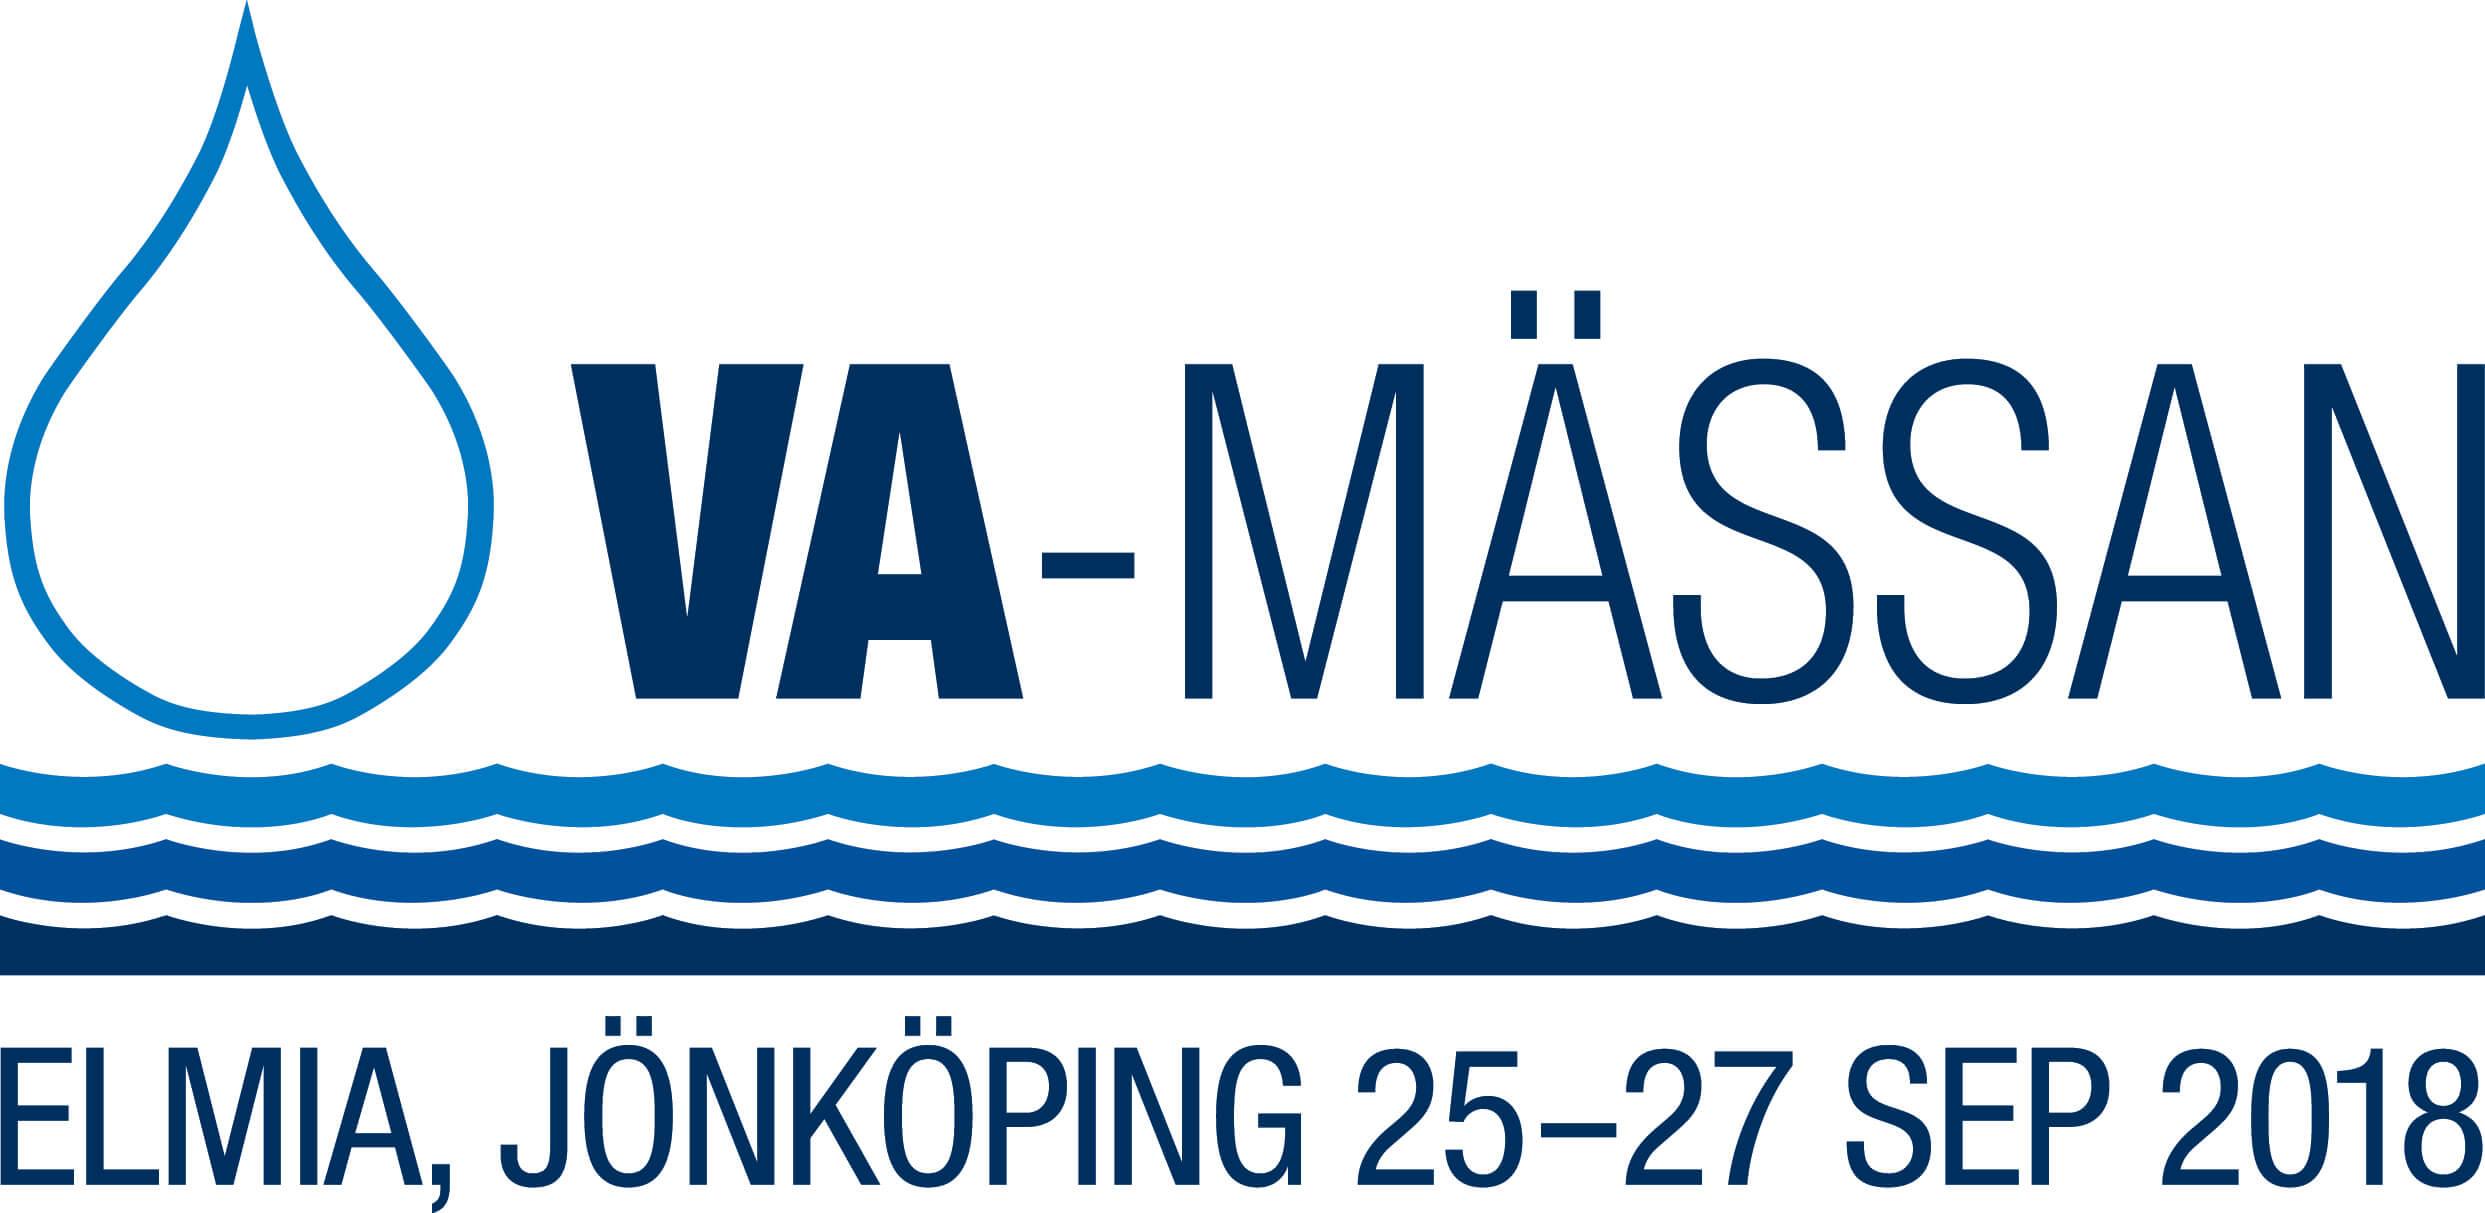 va-massan-elmia_logo_datum_2018_banor.jpg